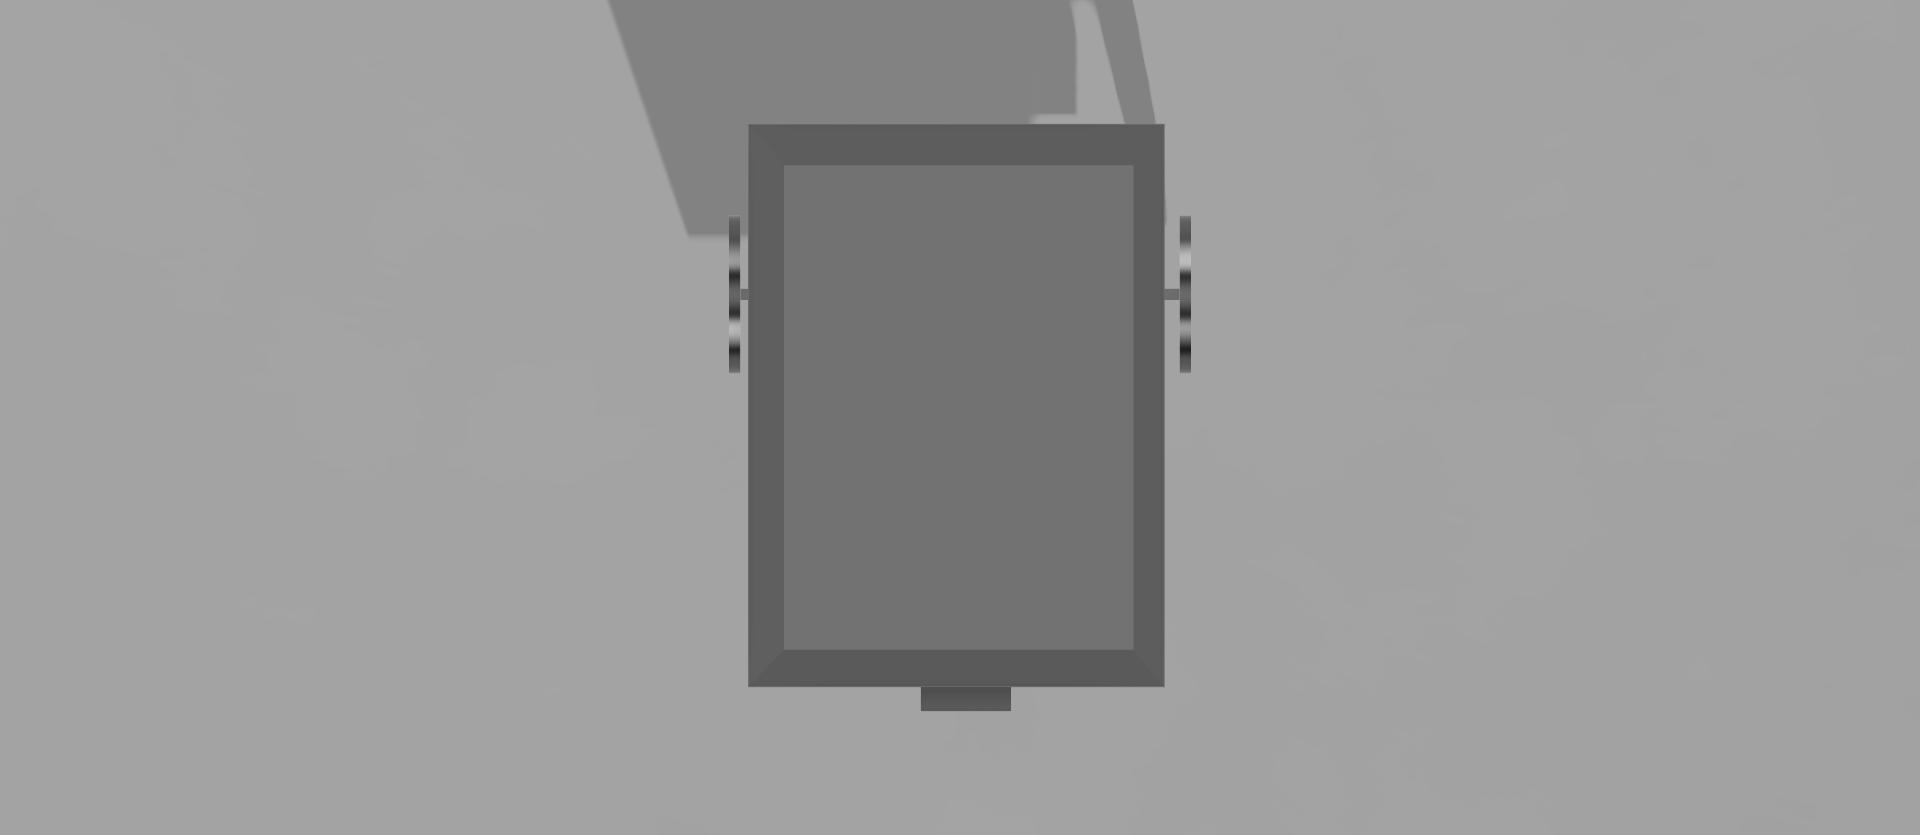 Rendered CAD Model - Top